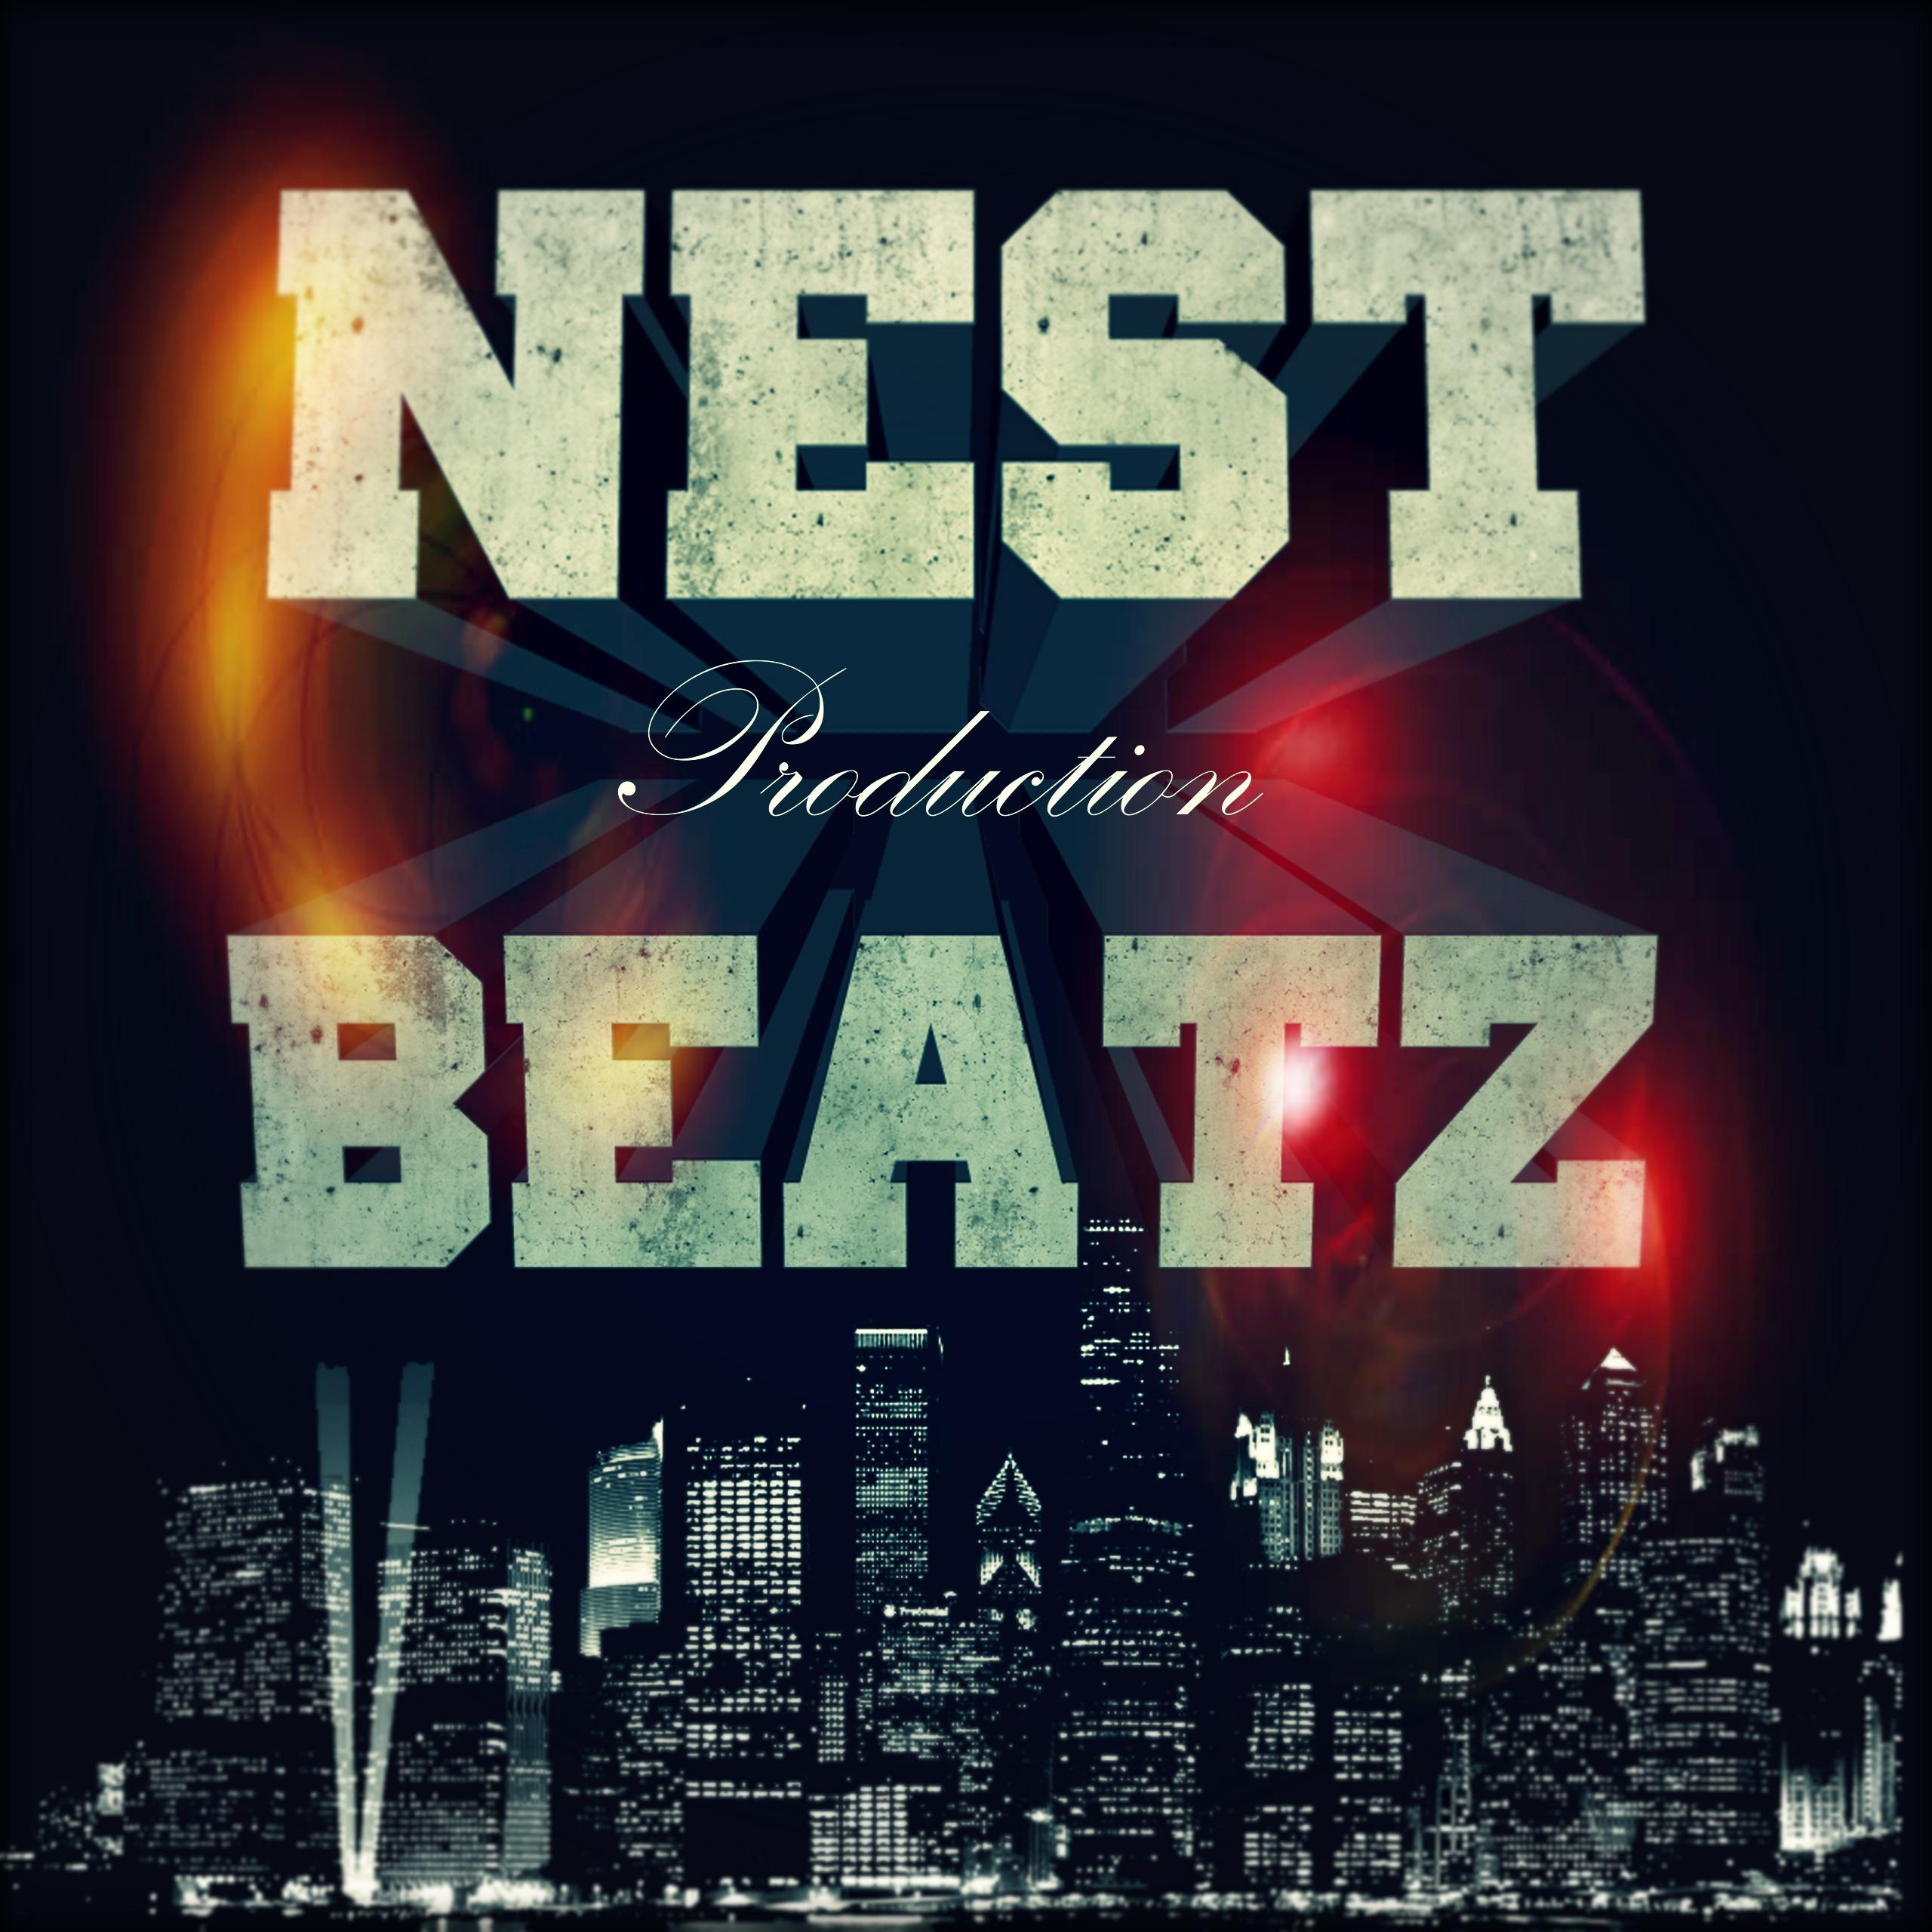 Nest Beatz